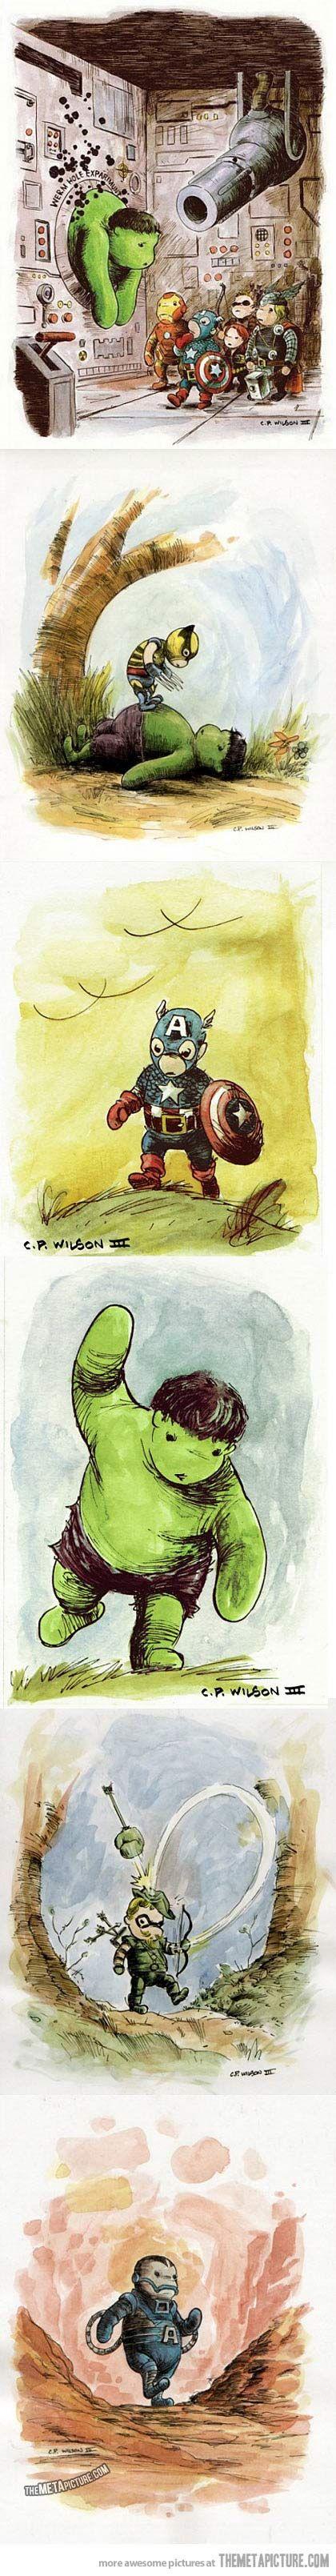 best Superheroes images on Pinterest